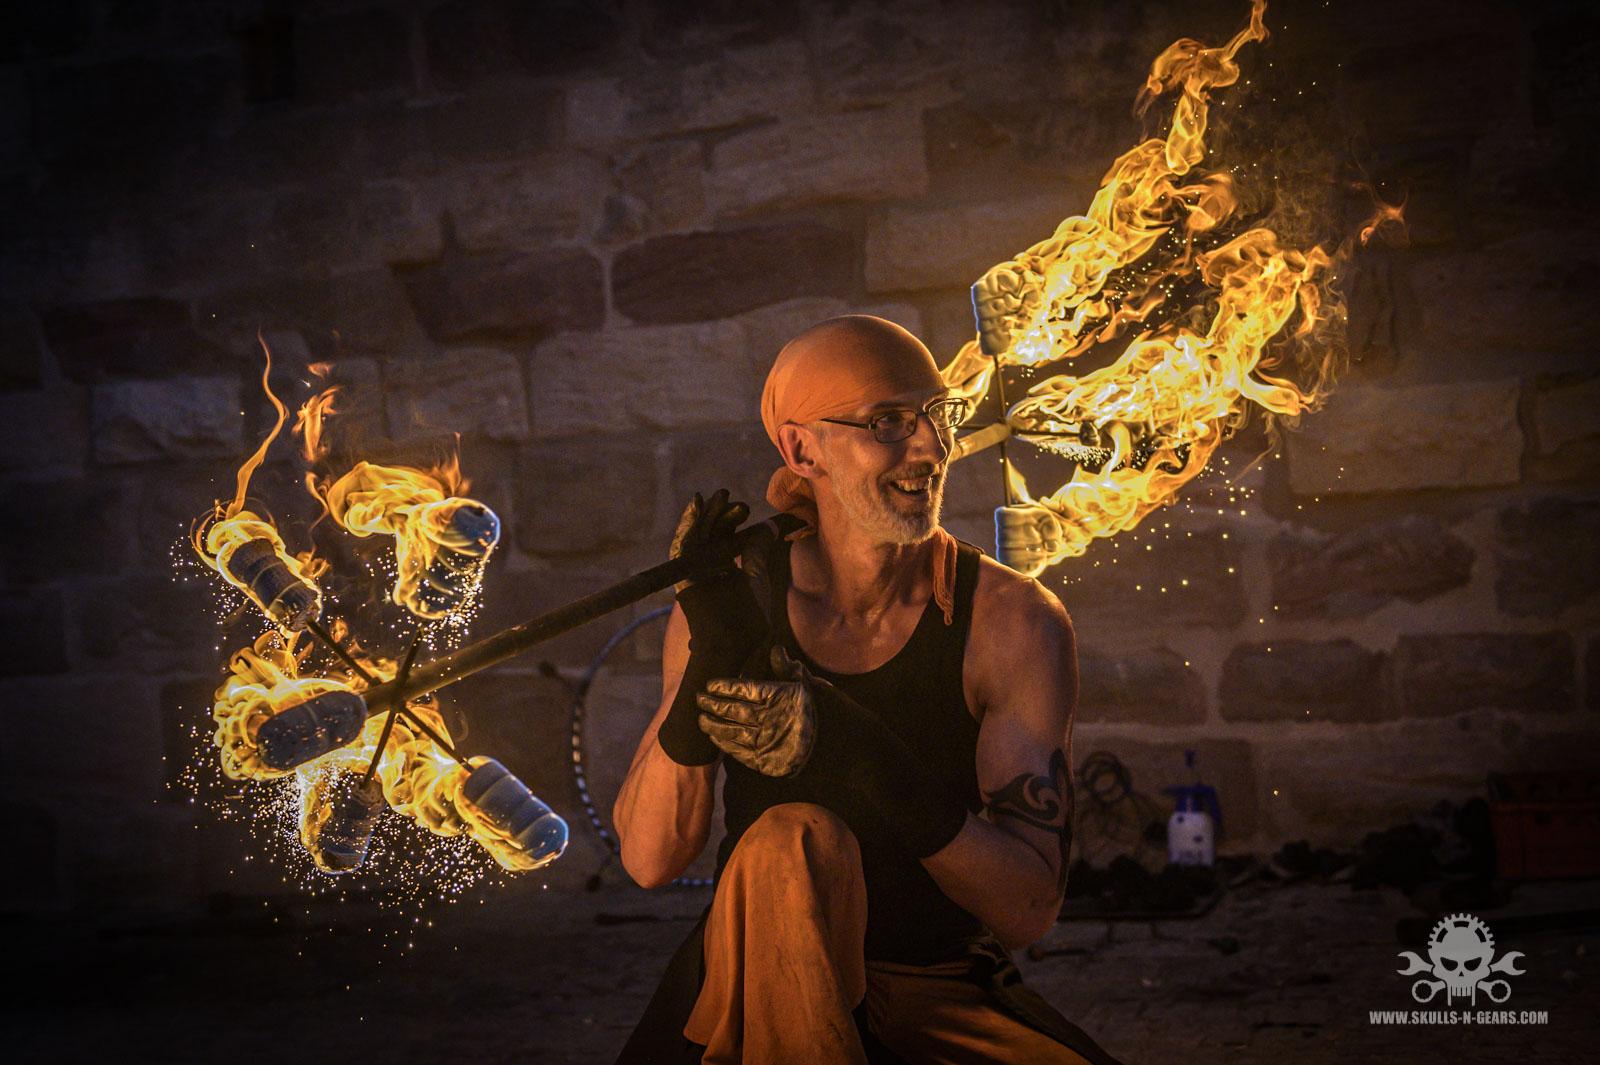 Feuertanz Festival 2019 - Feuershow-1235